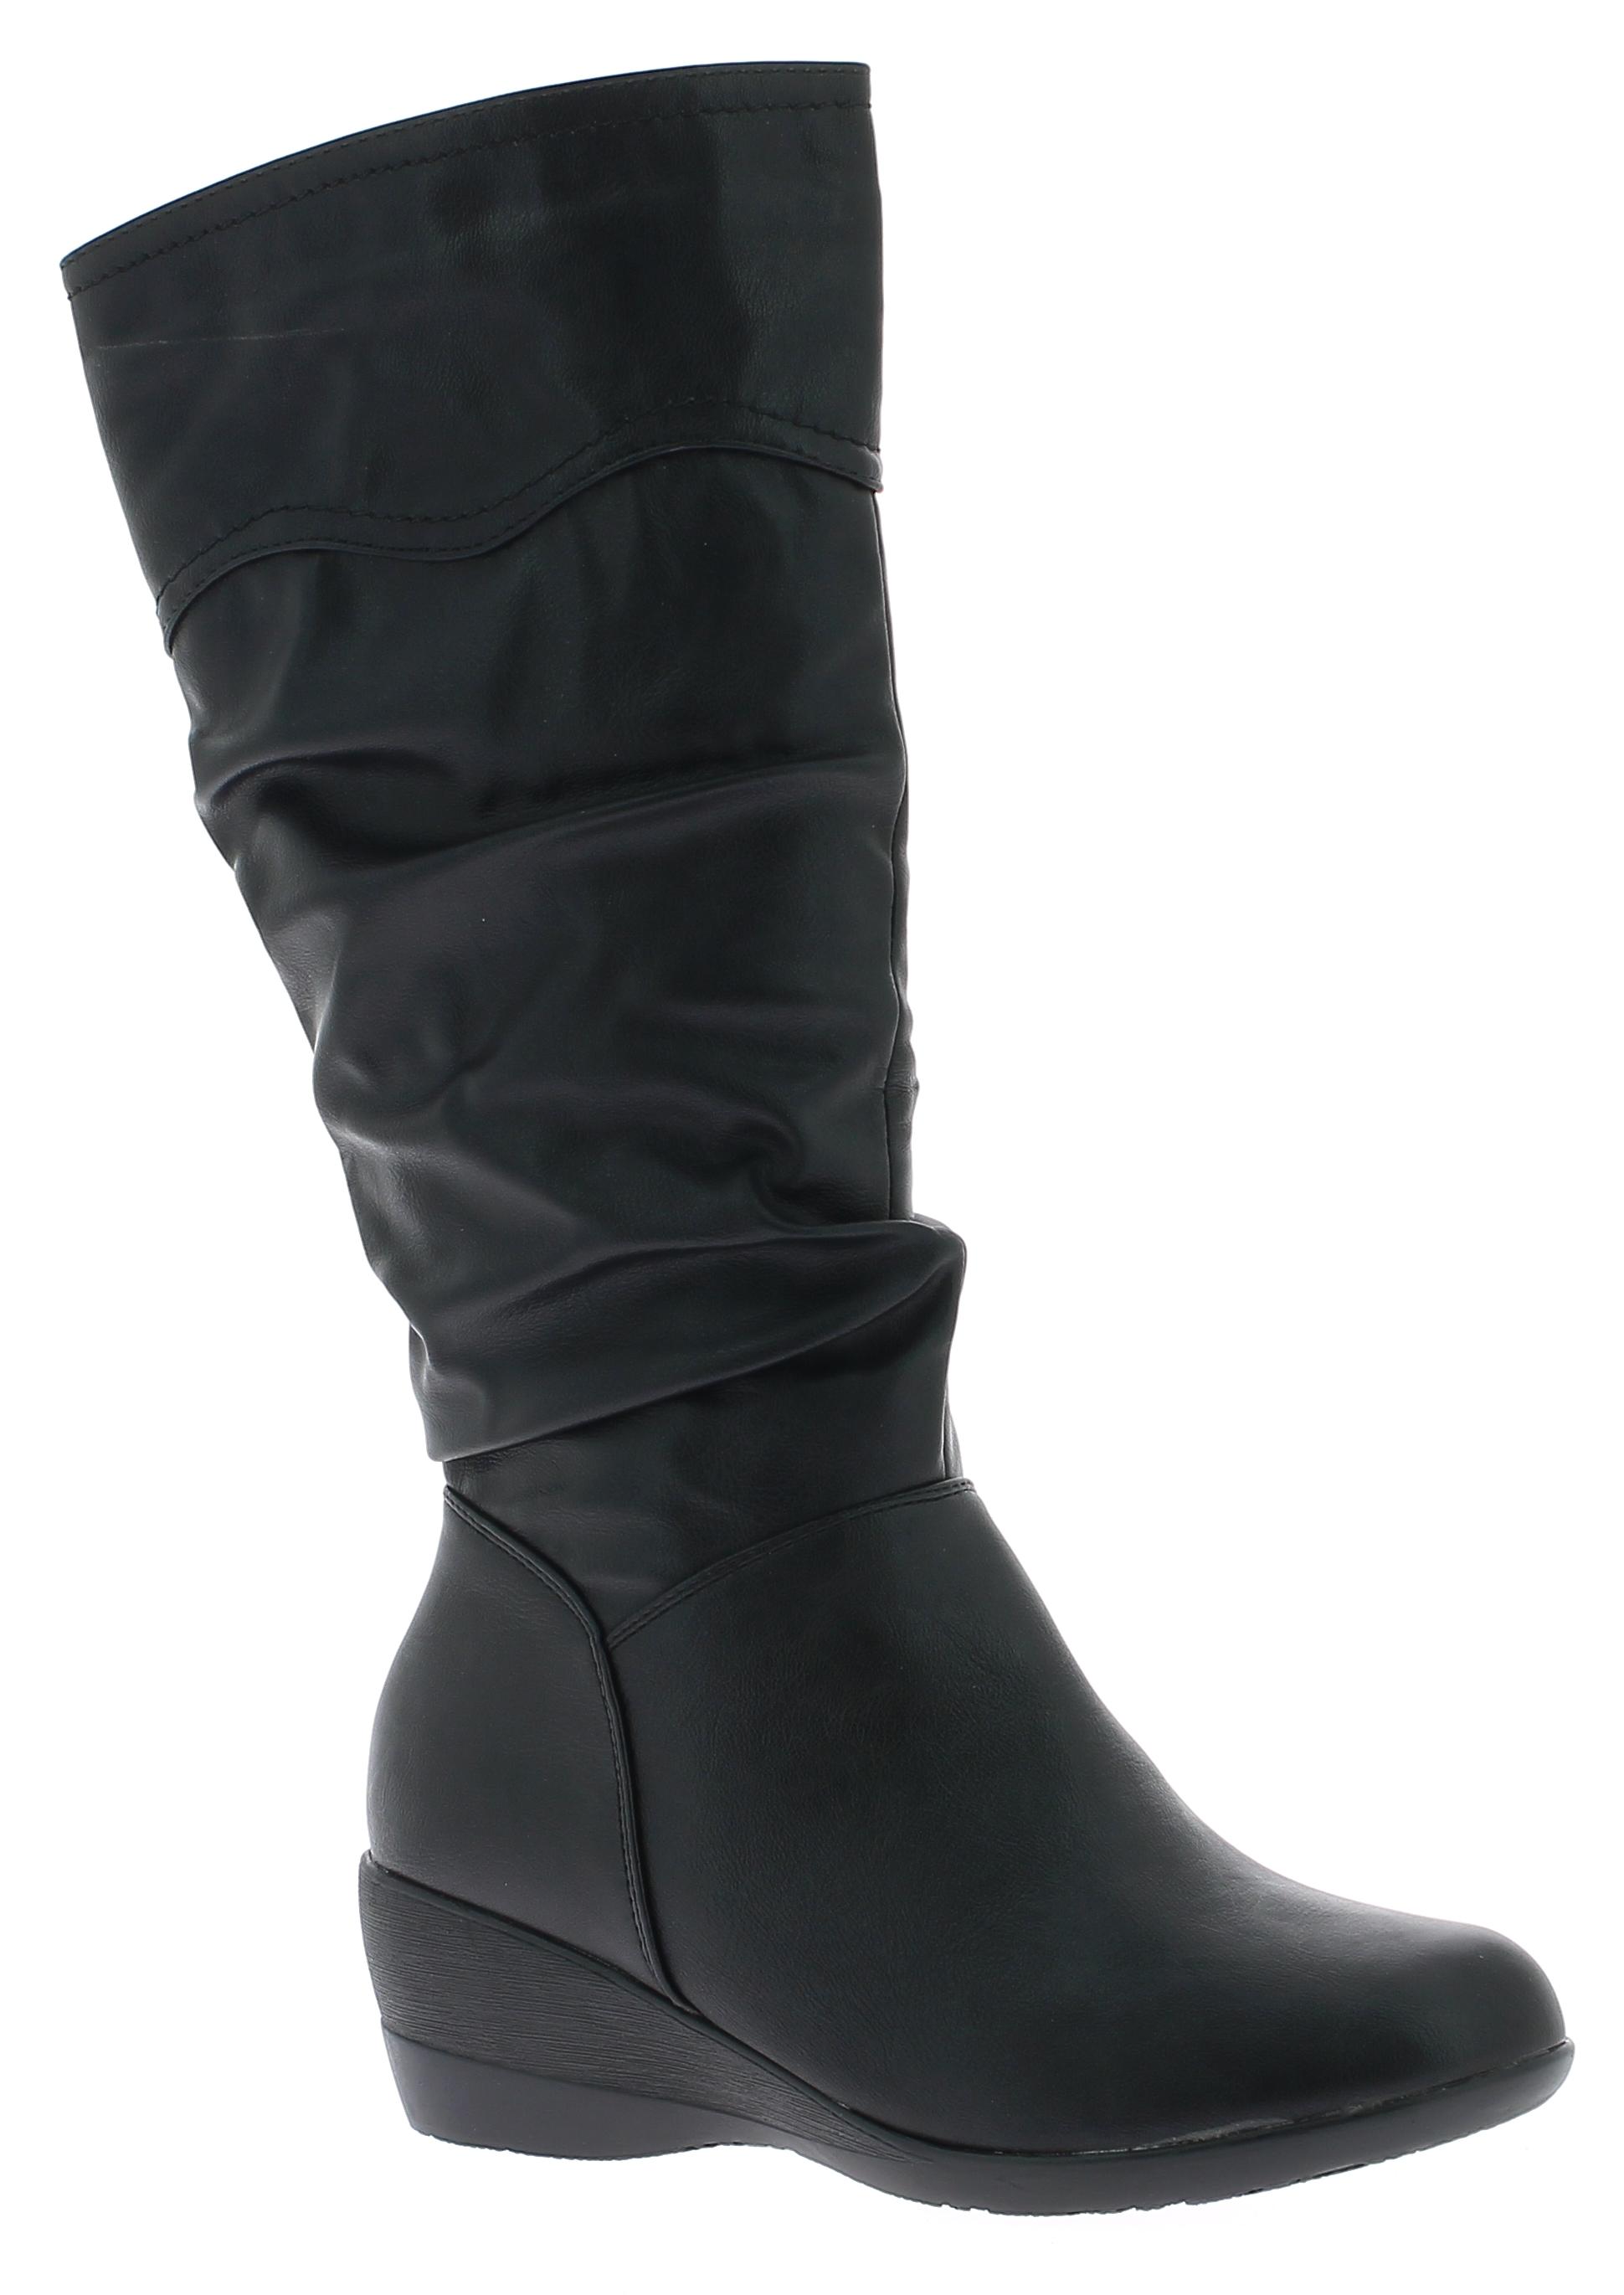 IQSHOES Γυναικεία Μπότα FS223 Μαύρο - IqShoes - FS223 BLACK-black-36/1/15/7 παπούτσια  γυναικεία μποτάκια